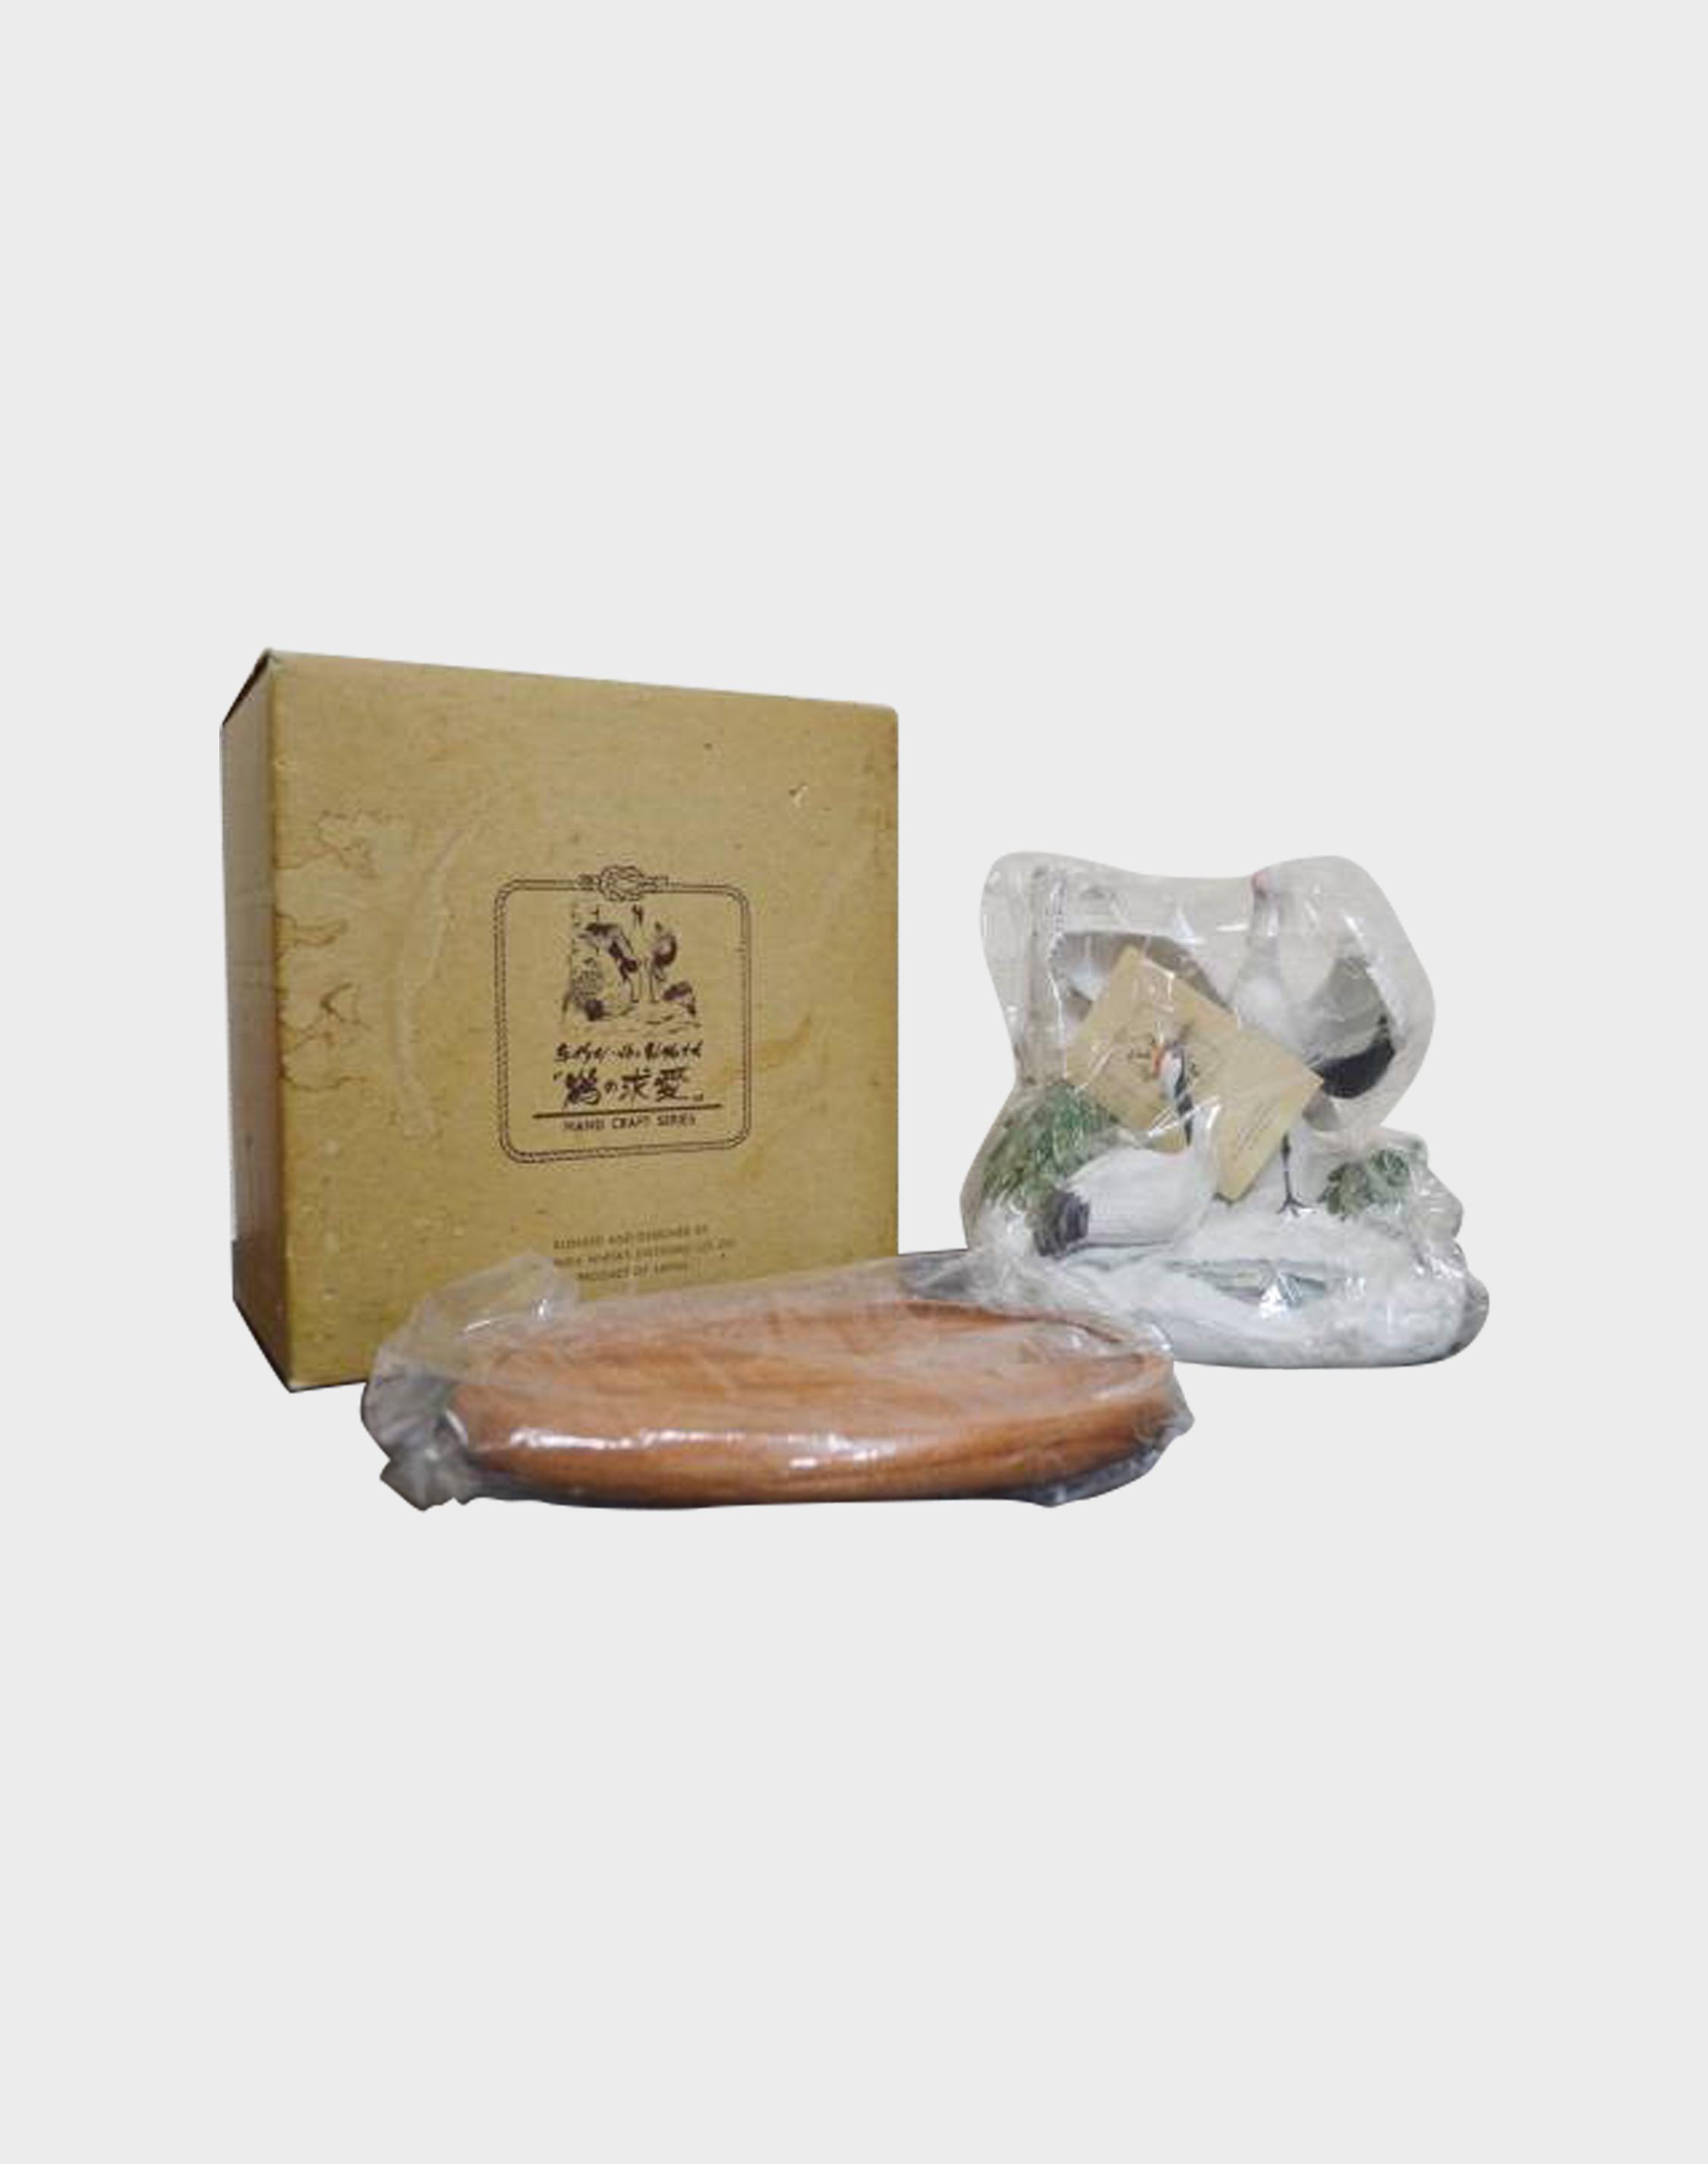 nikka taketsuru love ceramic old whisky japanese. Black Bedroom Furniture Sets. Home Design Ideas